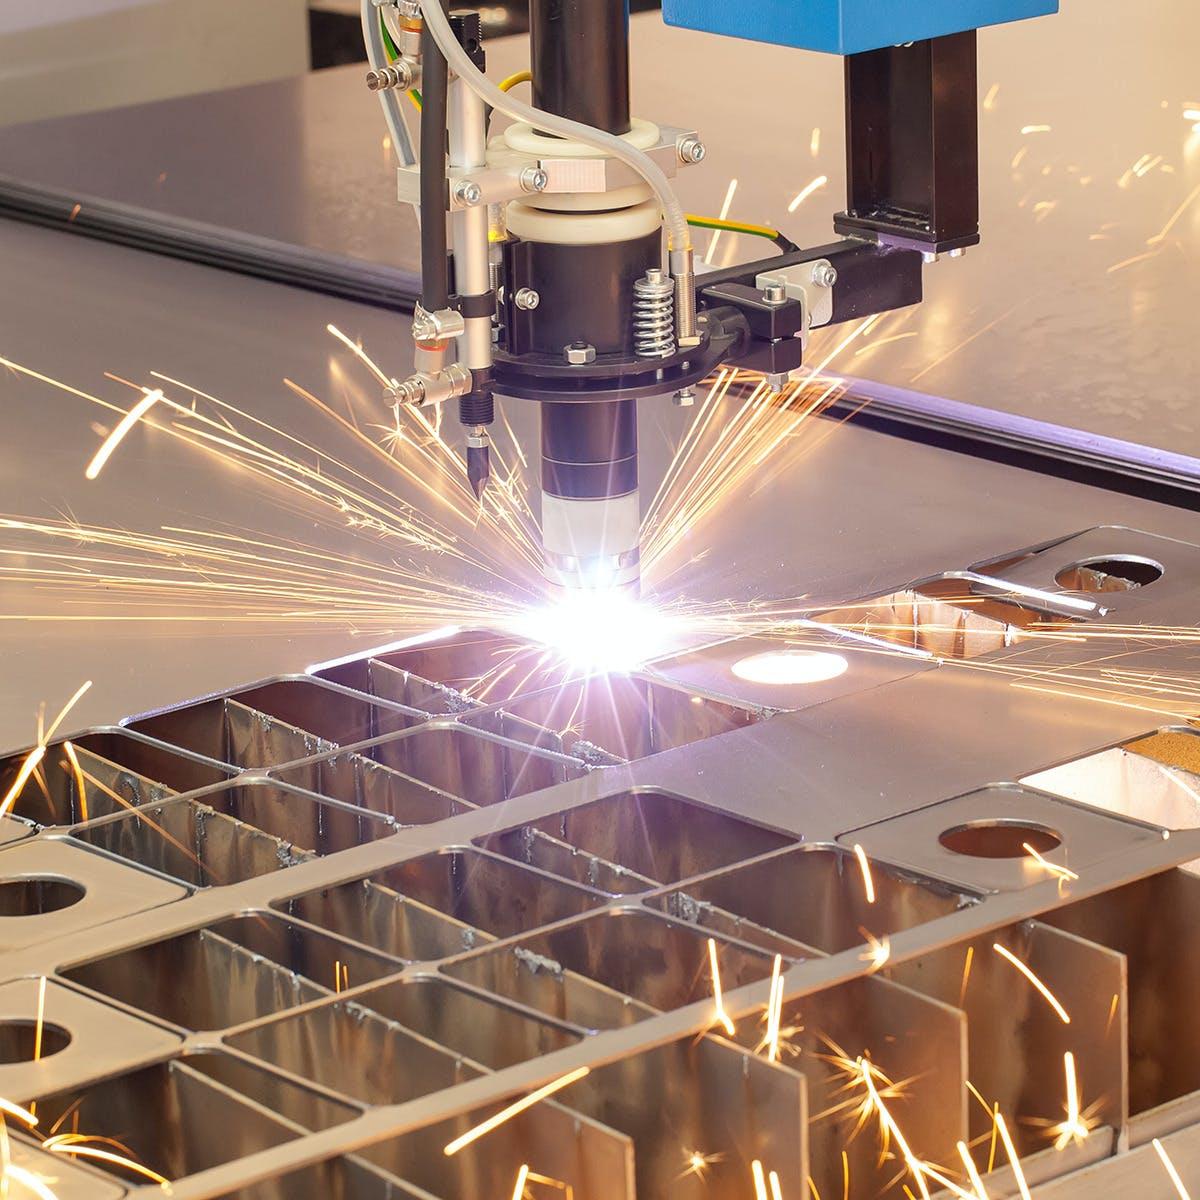 Digital Manufacturing & Design